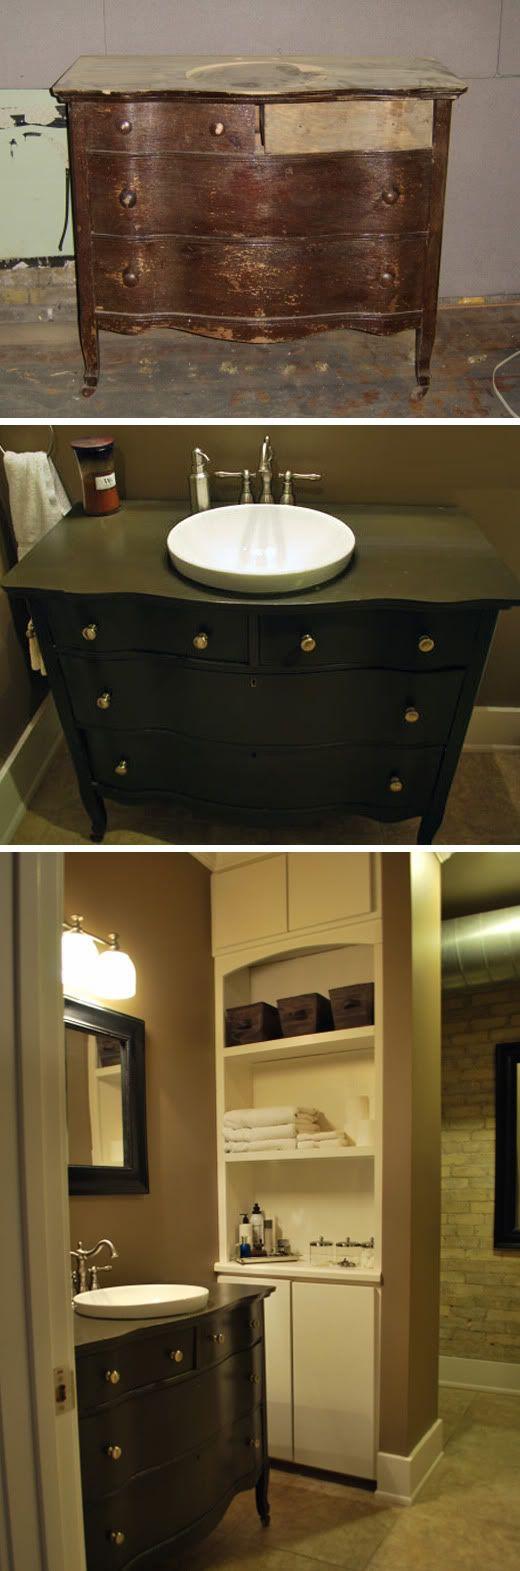 Make a Bathroom Vanity from an Old Dresser | ThriftyFun